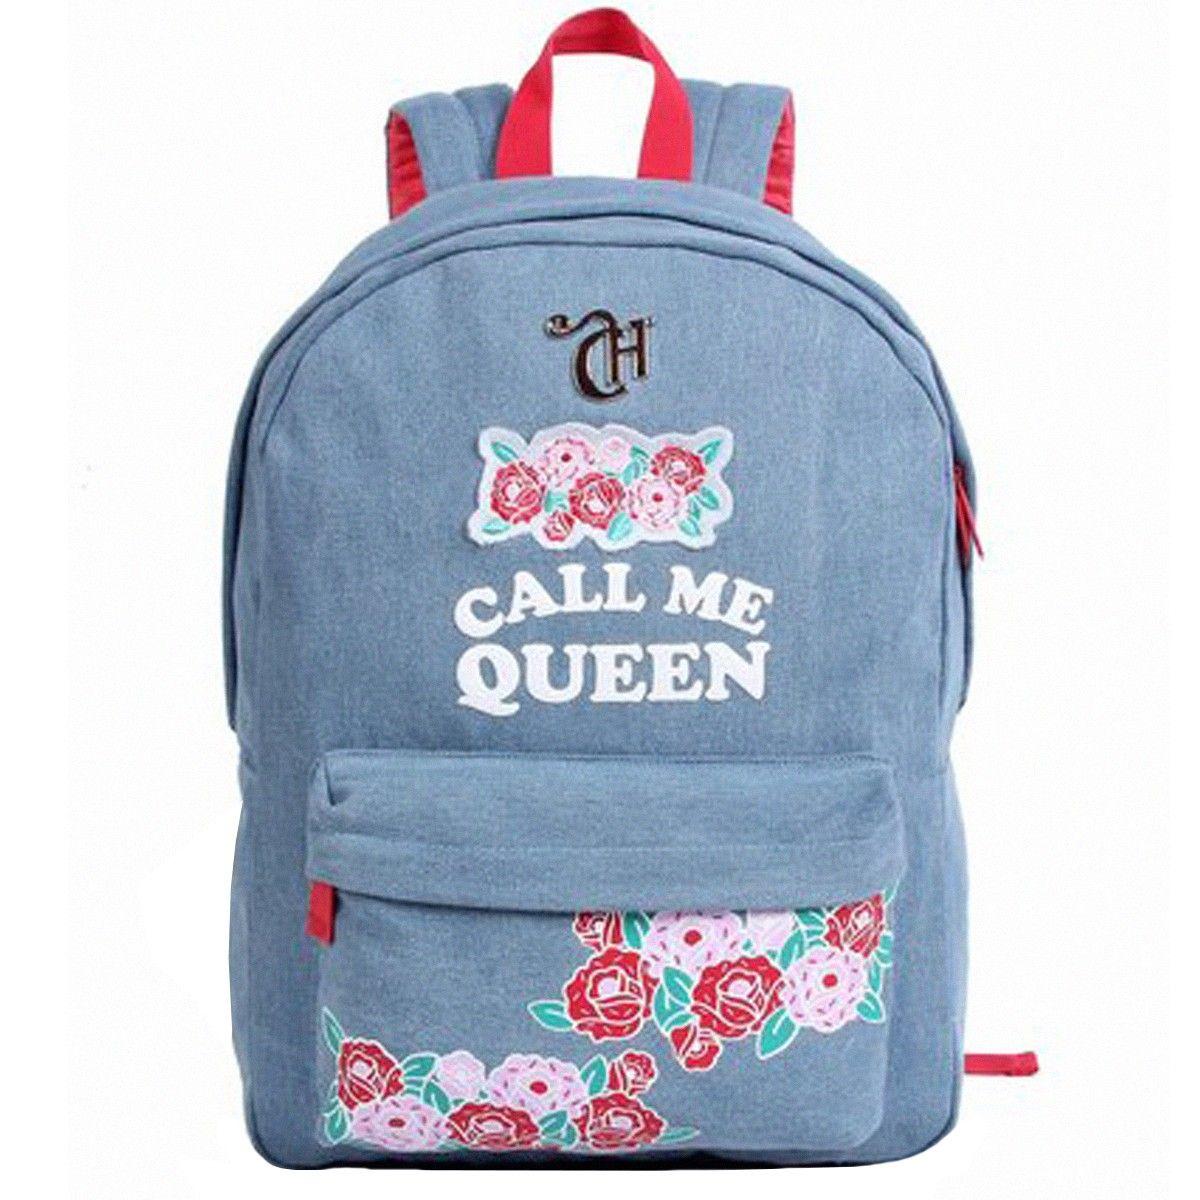 Mochila Capricho Jeans Call Me Queen | Mochila capricho